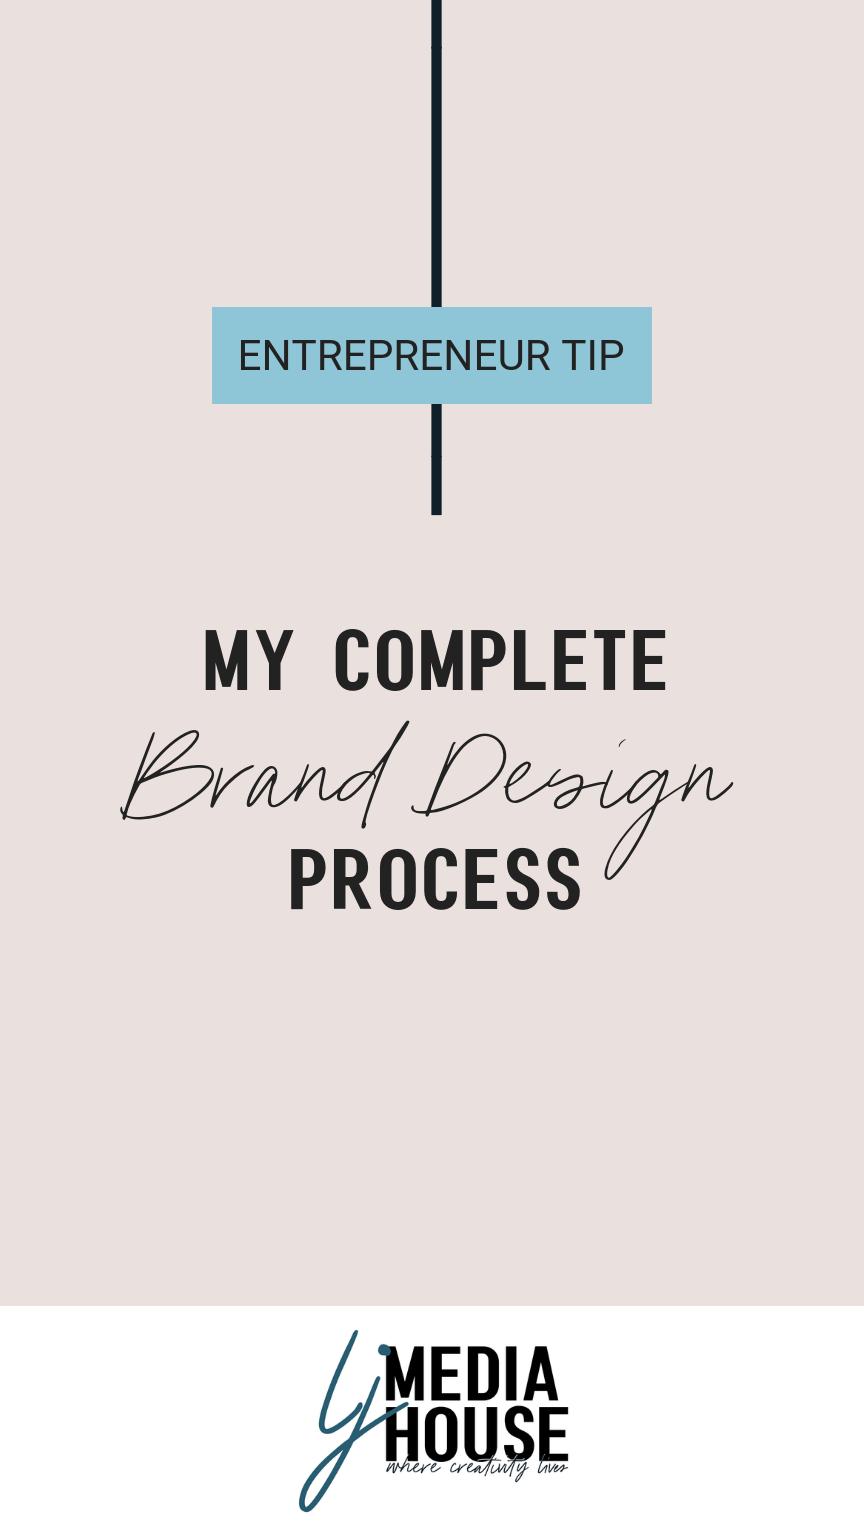 My Complete Brand Design Process